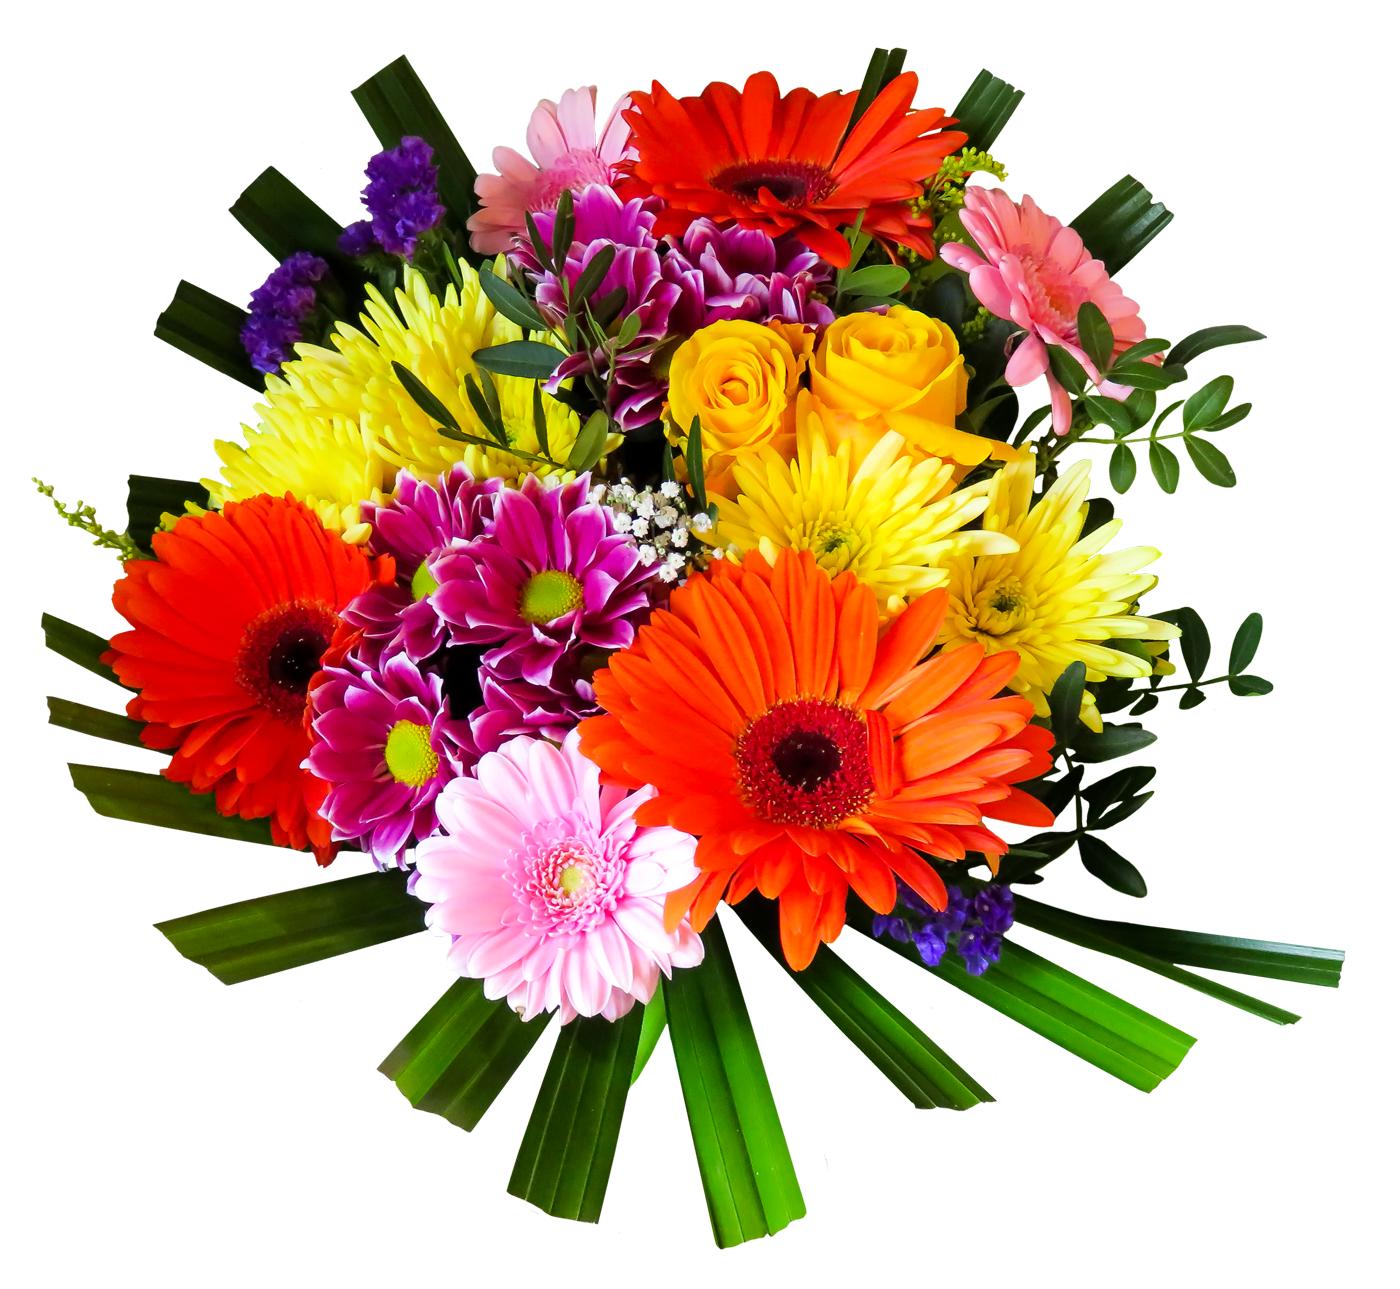 Png Colourful Flowers HD - shan studio